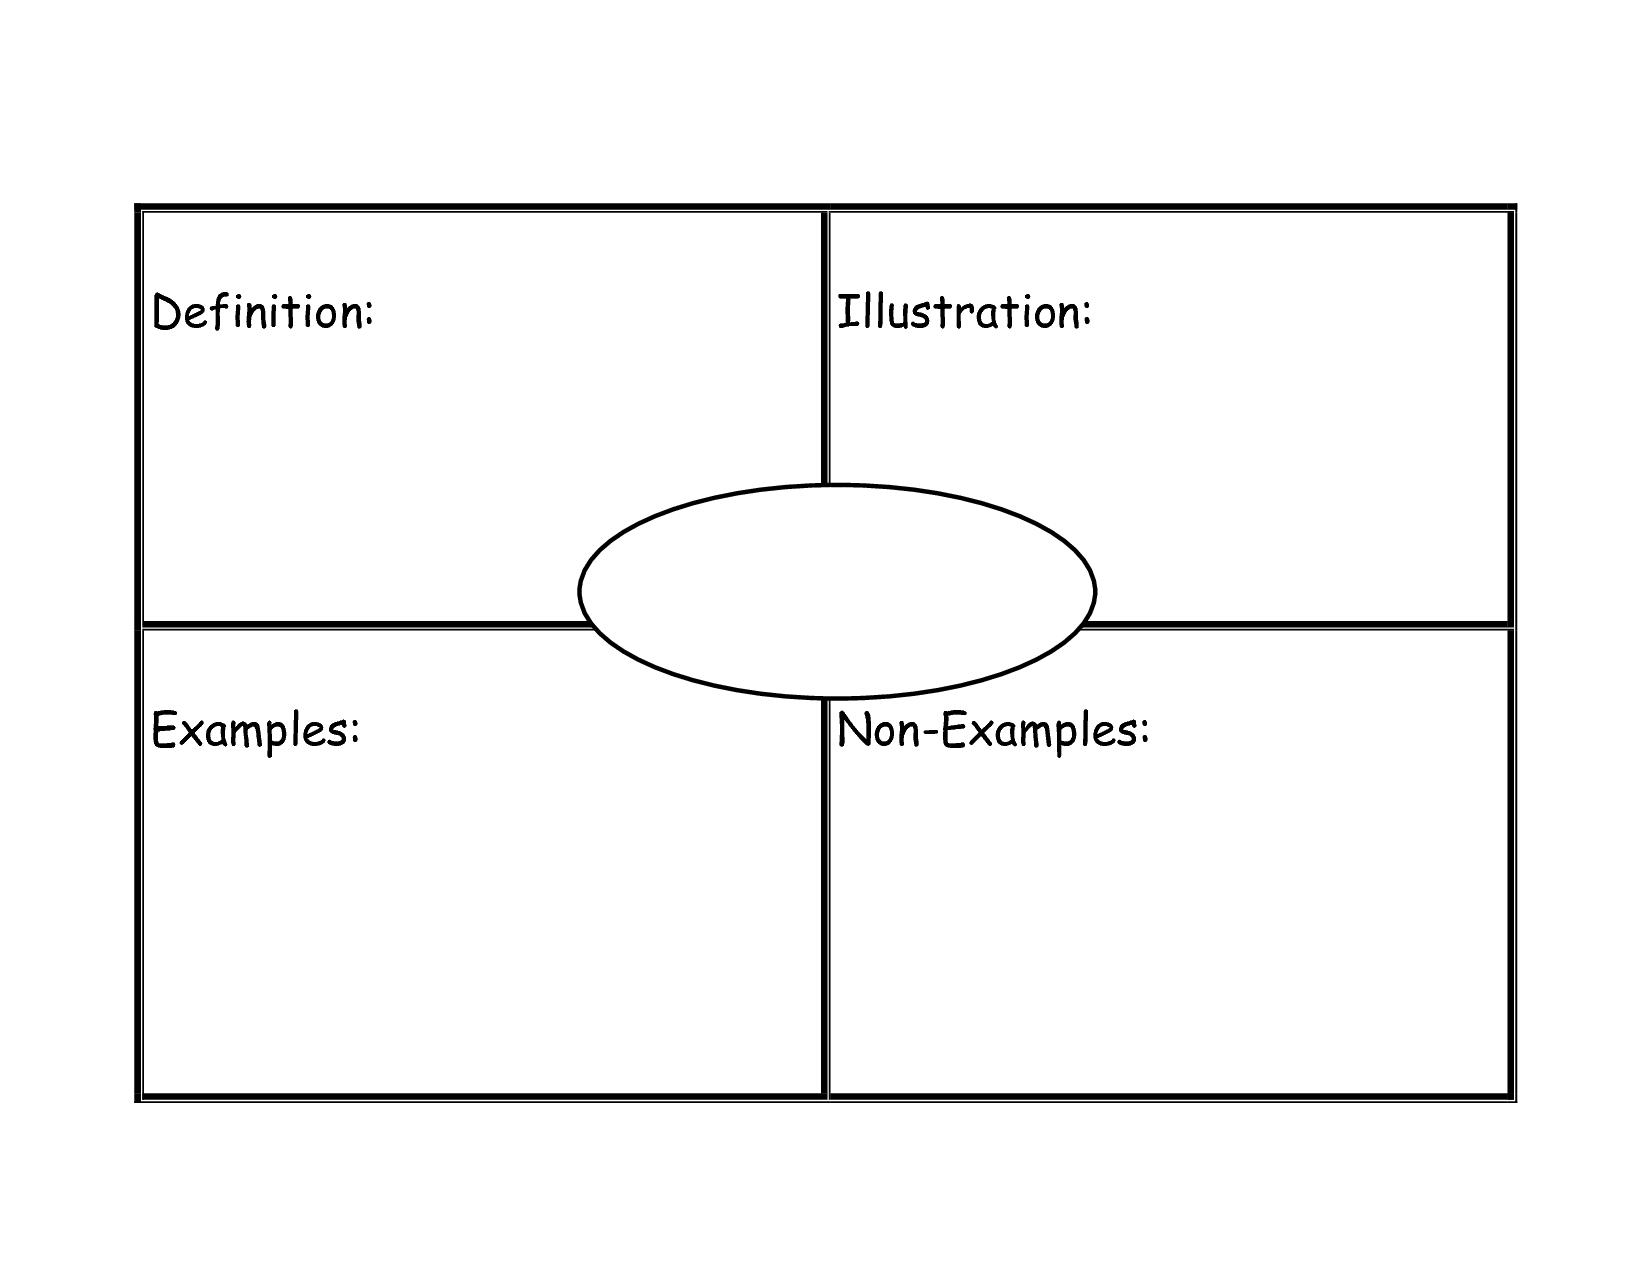 i pinimg com originals 83 53 b2 8353b28d7512362ae9 graphic model organizer frayer diagram [ 1650 x 1275 Pixel ]